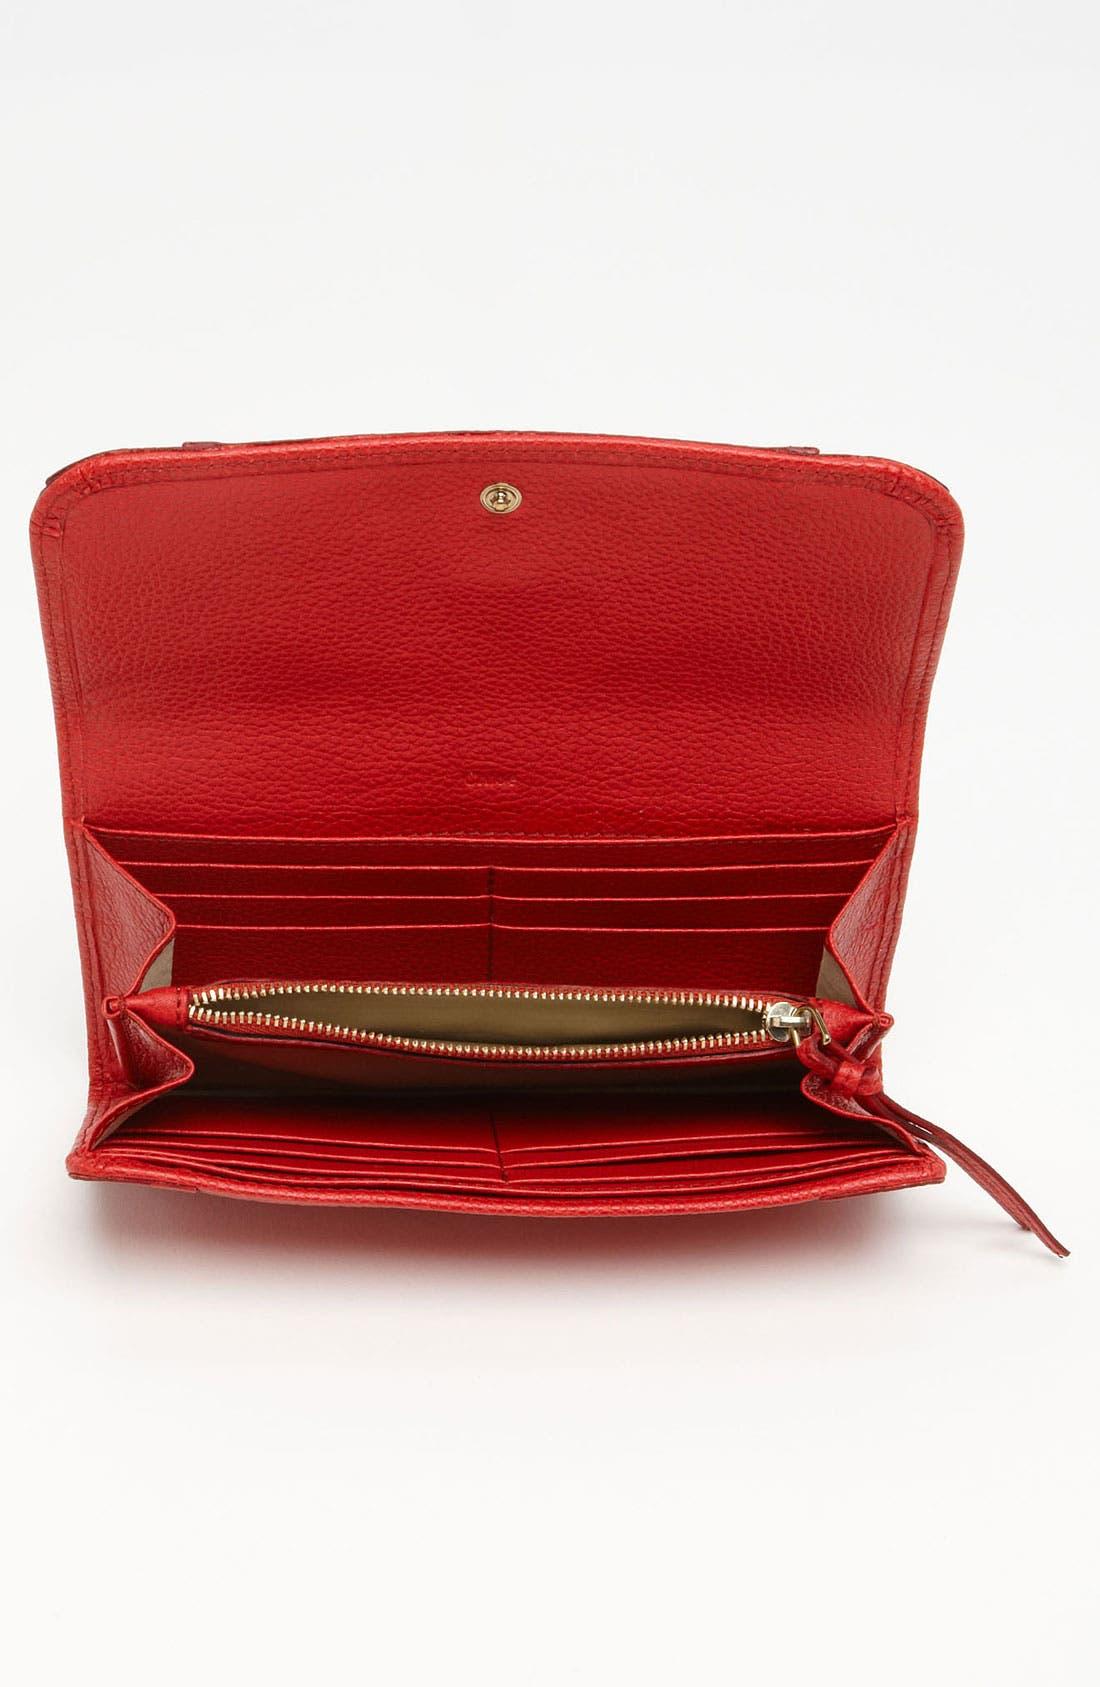 Alternate Image 3  - Chloé 'Paraty' Leather Wallet